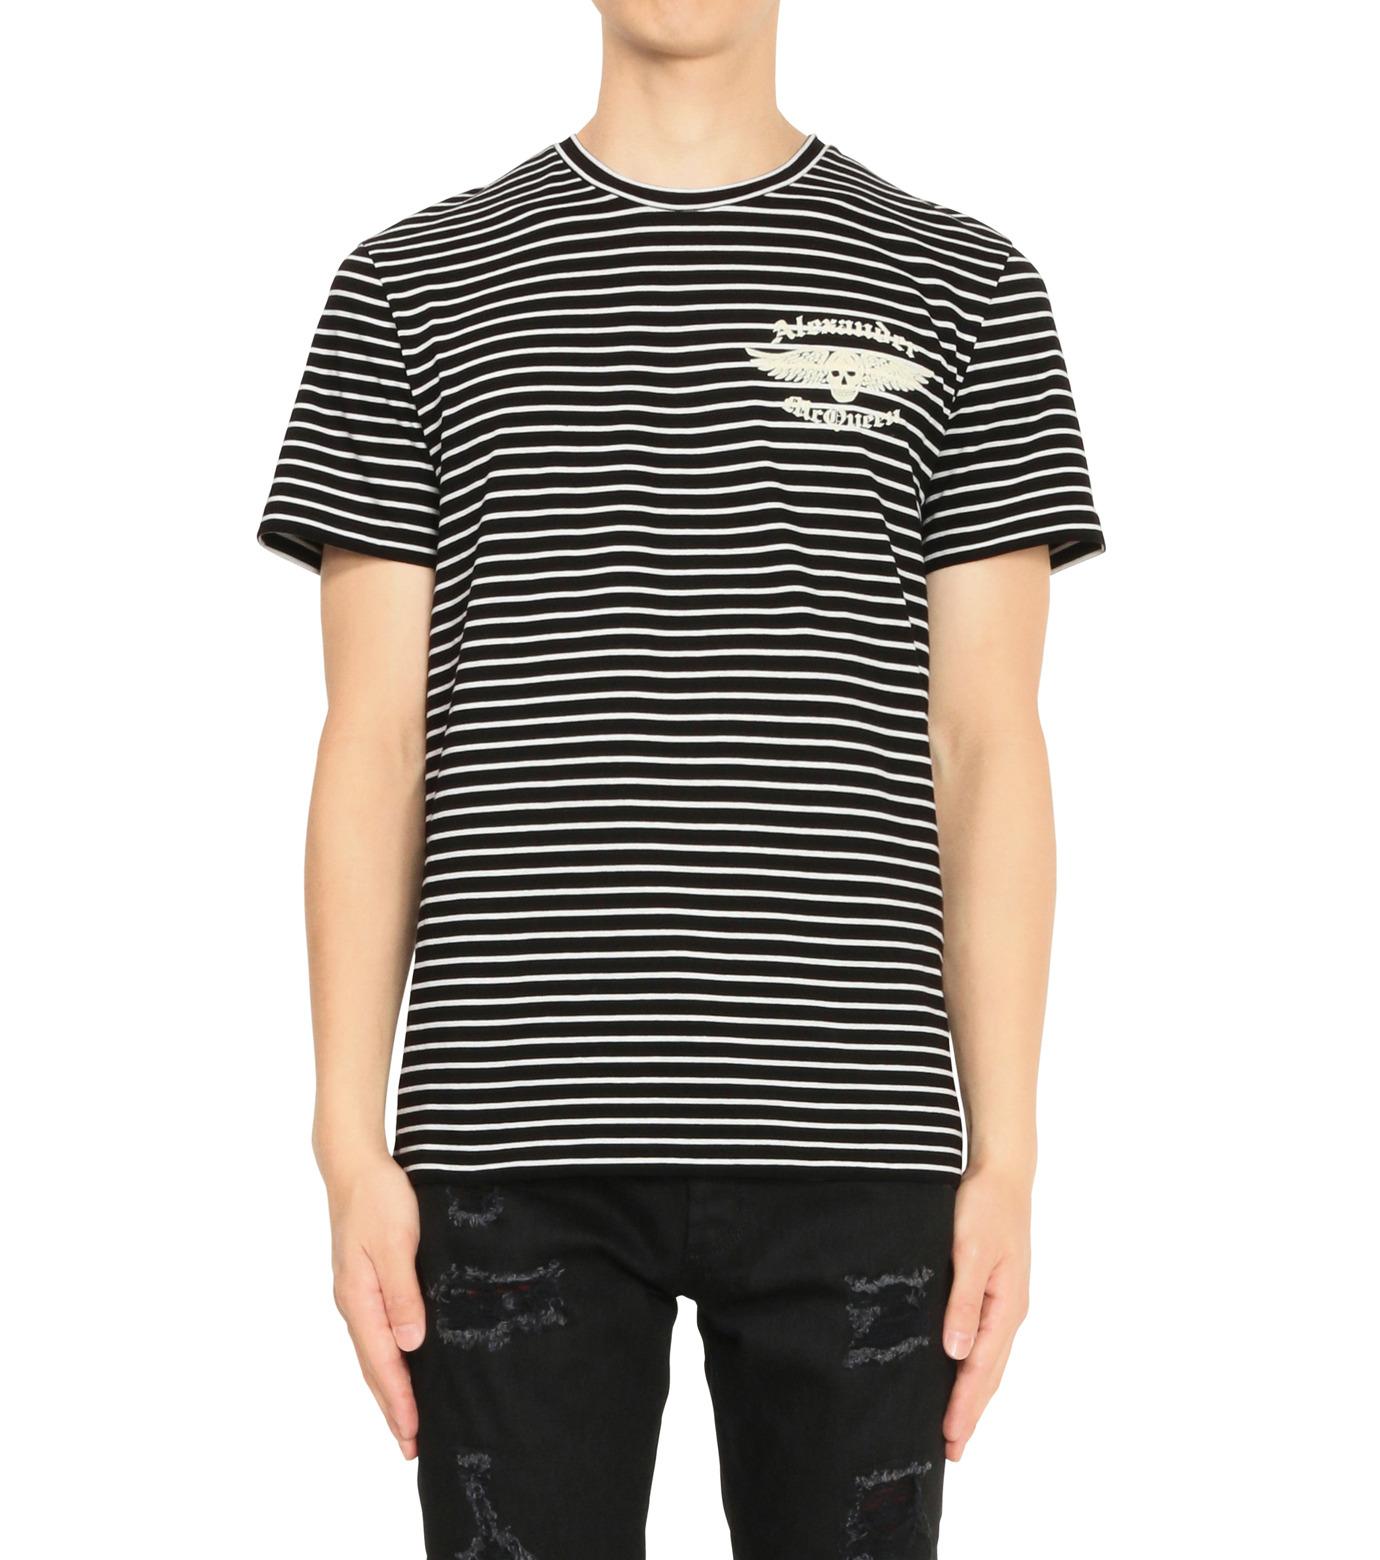 Alexander McQueen(アレキサンダーマックイーン)のBorder T Shirt-BLACK(カットソー/cut and sewn)-430934-13 拡大詳細画像1